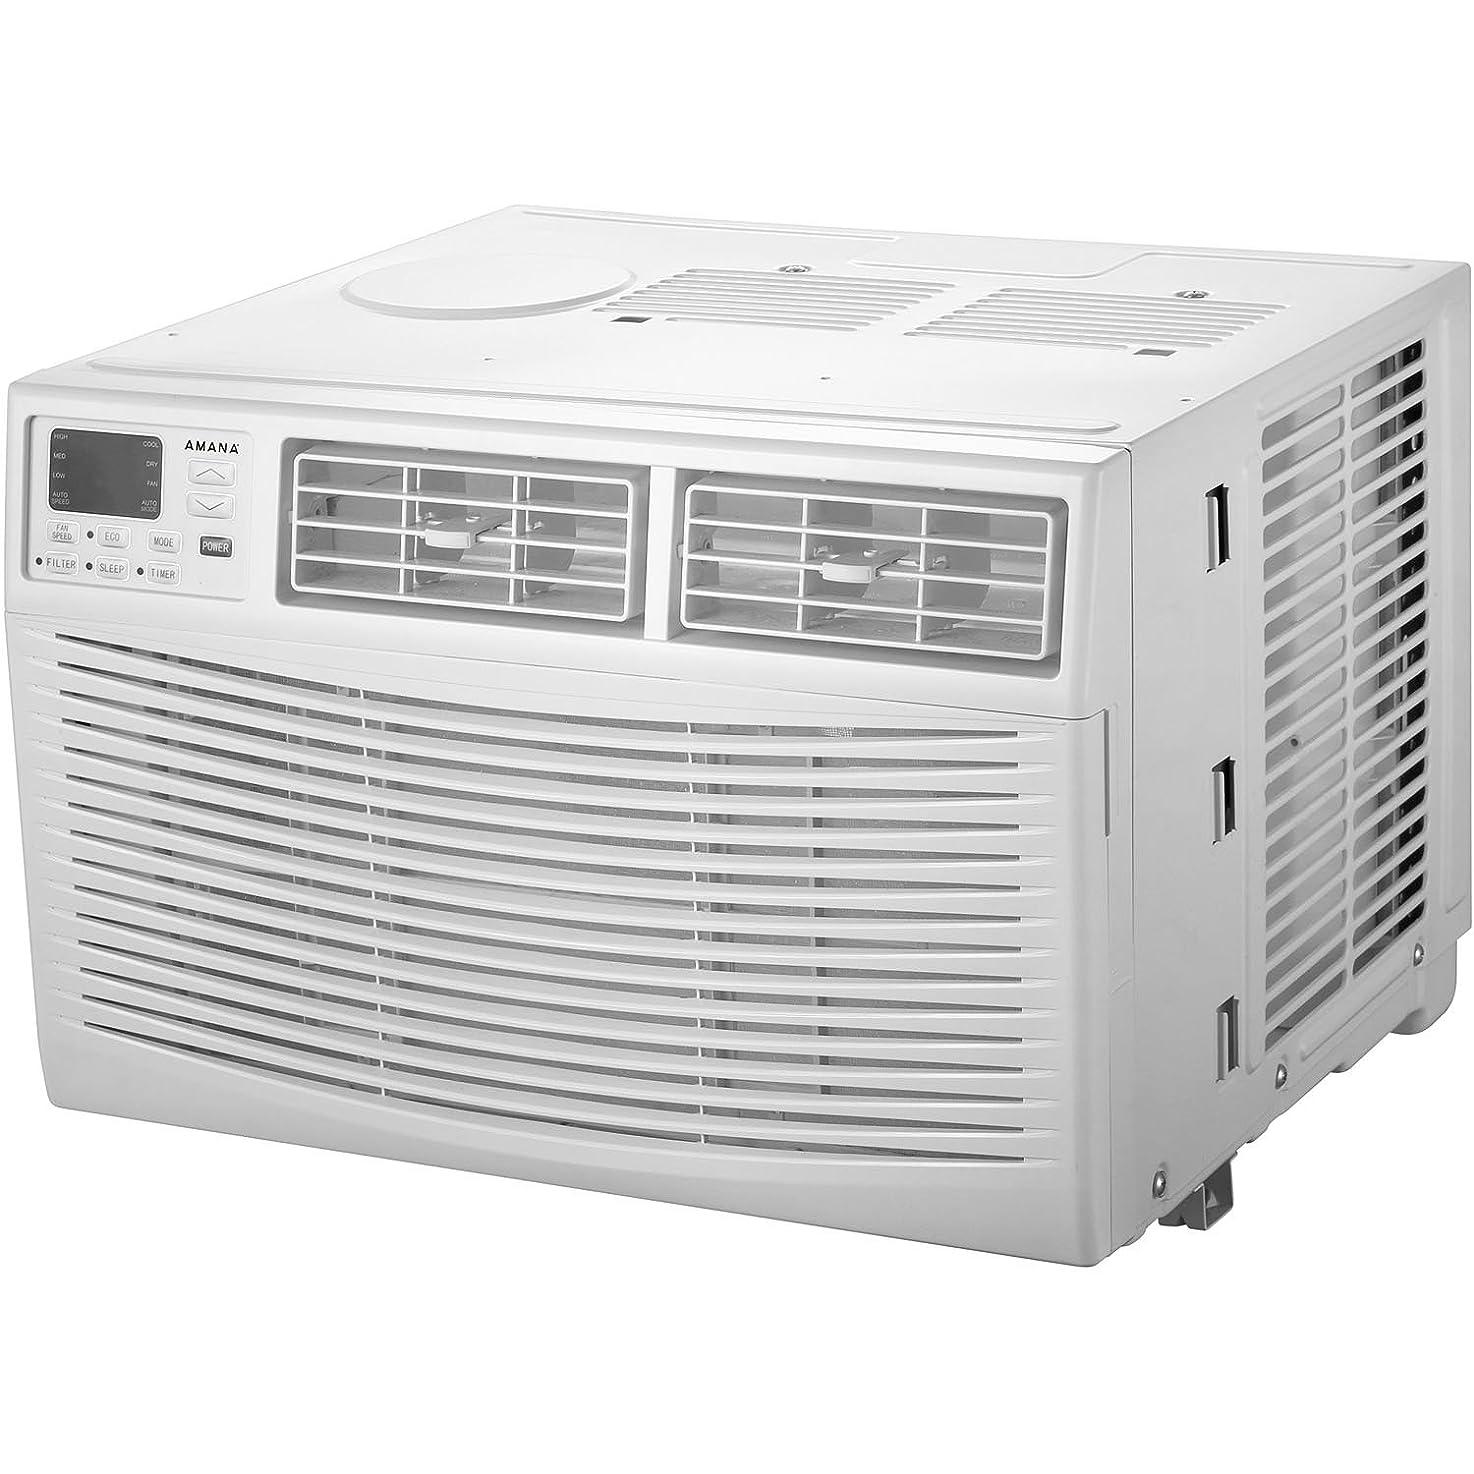 Amana 12,000 BTU 115V Window-Mounted Air Conditioner with Remote Control, White equdffwcjyysx9